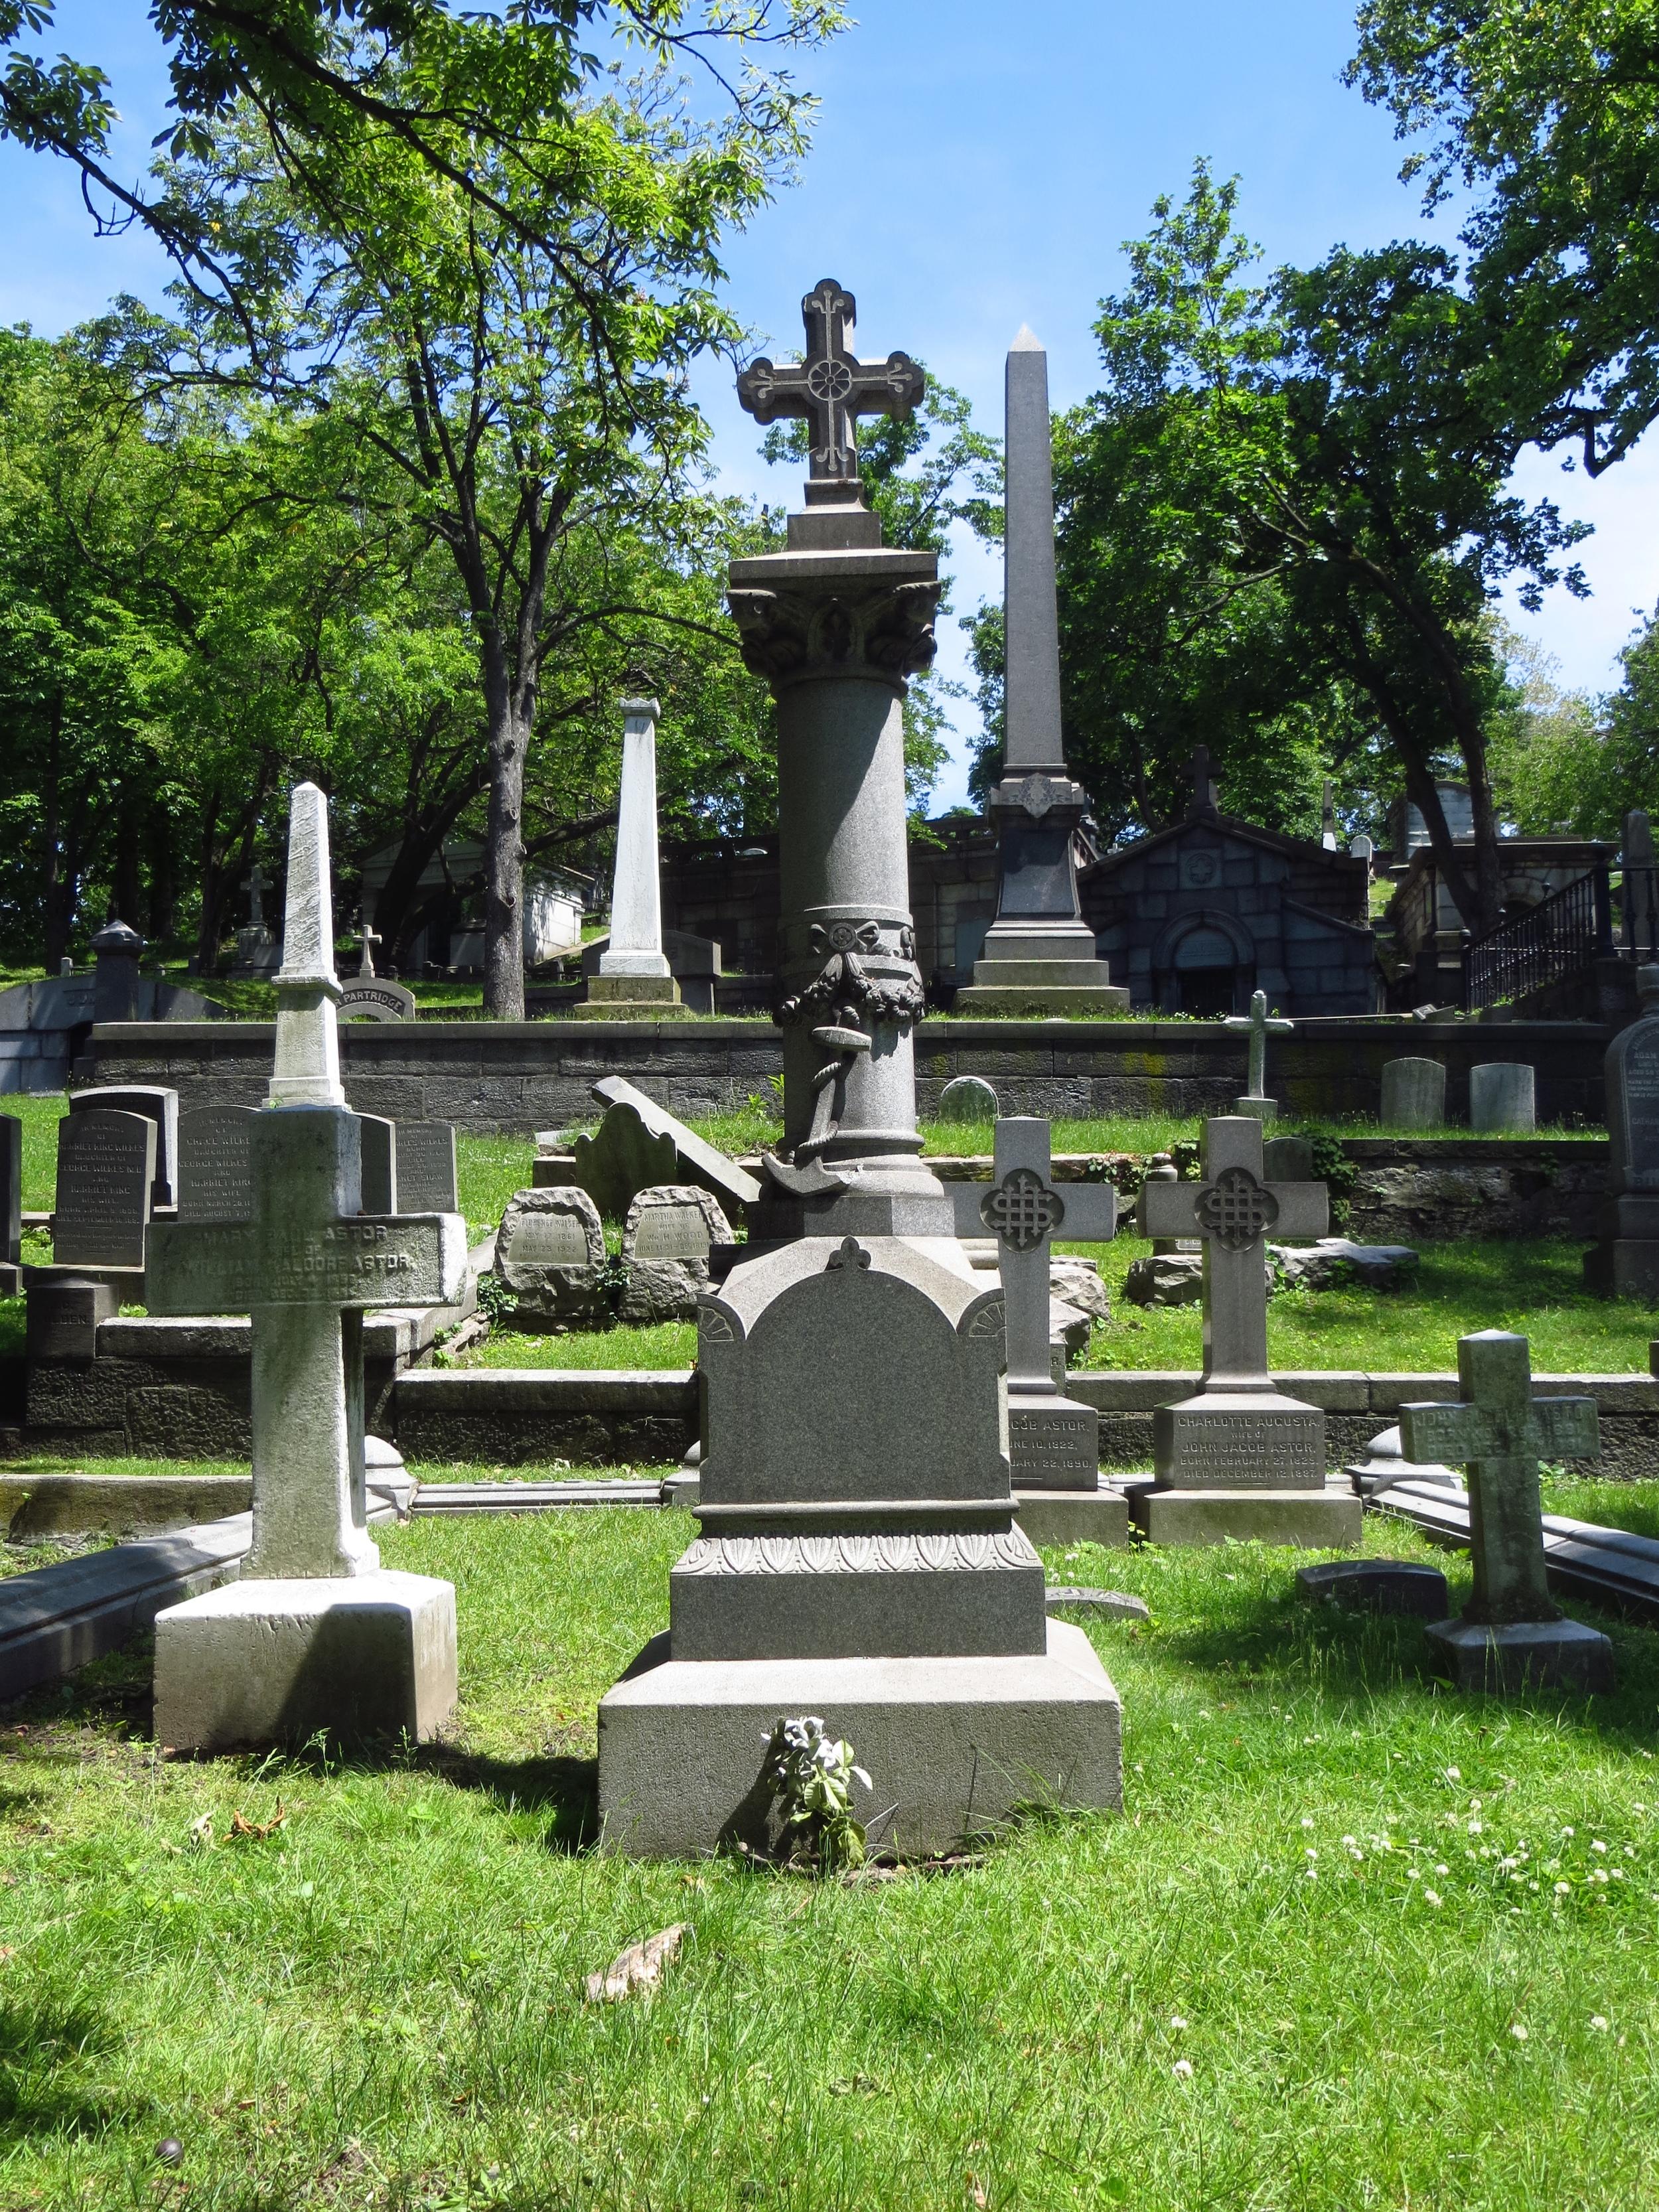 Gravestone of John Jacob Astor IV (died on the Titanic)